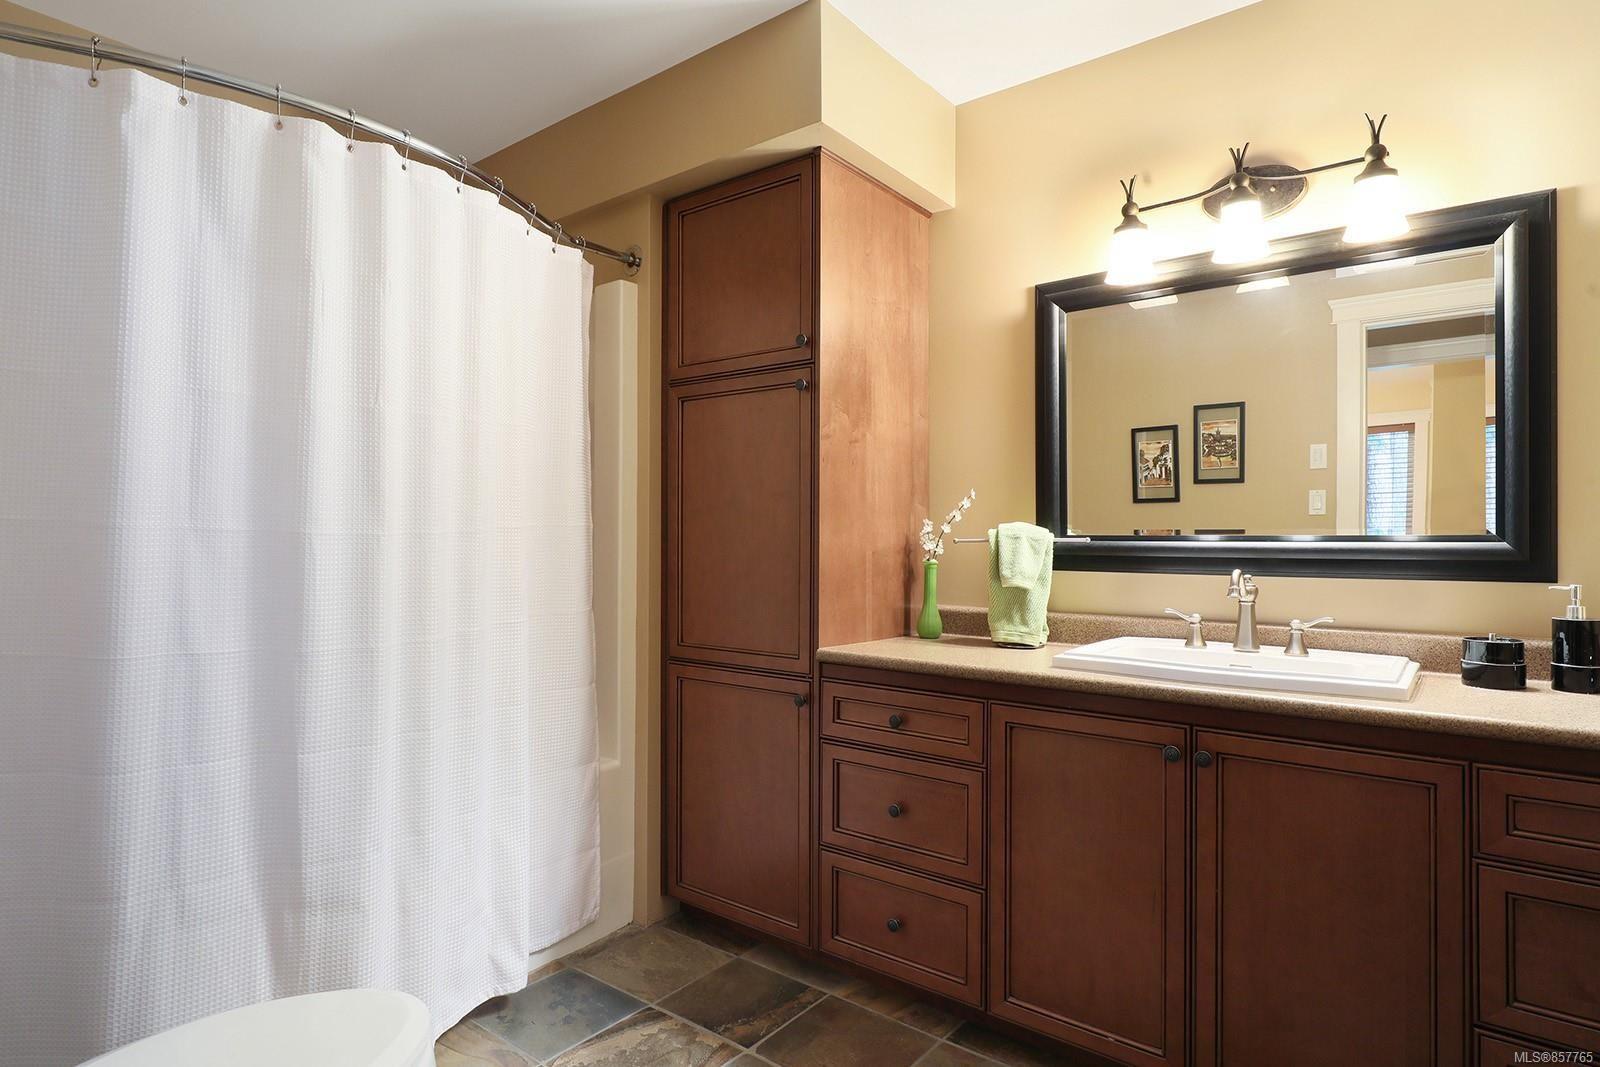 Photo 37: Photos: 1516 Highridge Dr in : CV Comox (Town of) House for sale (Comox Valley)  : MLS®# 857765